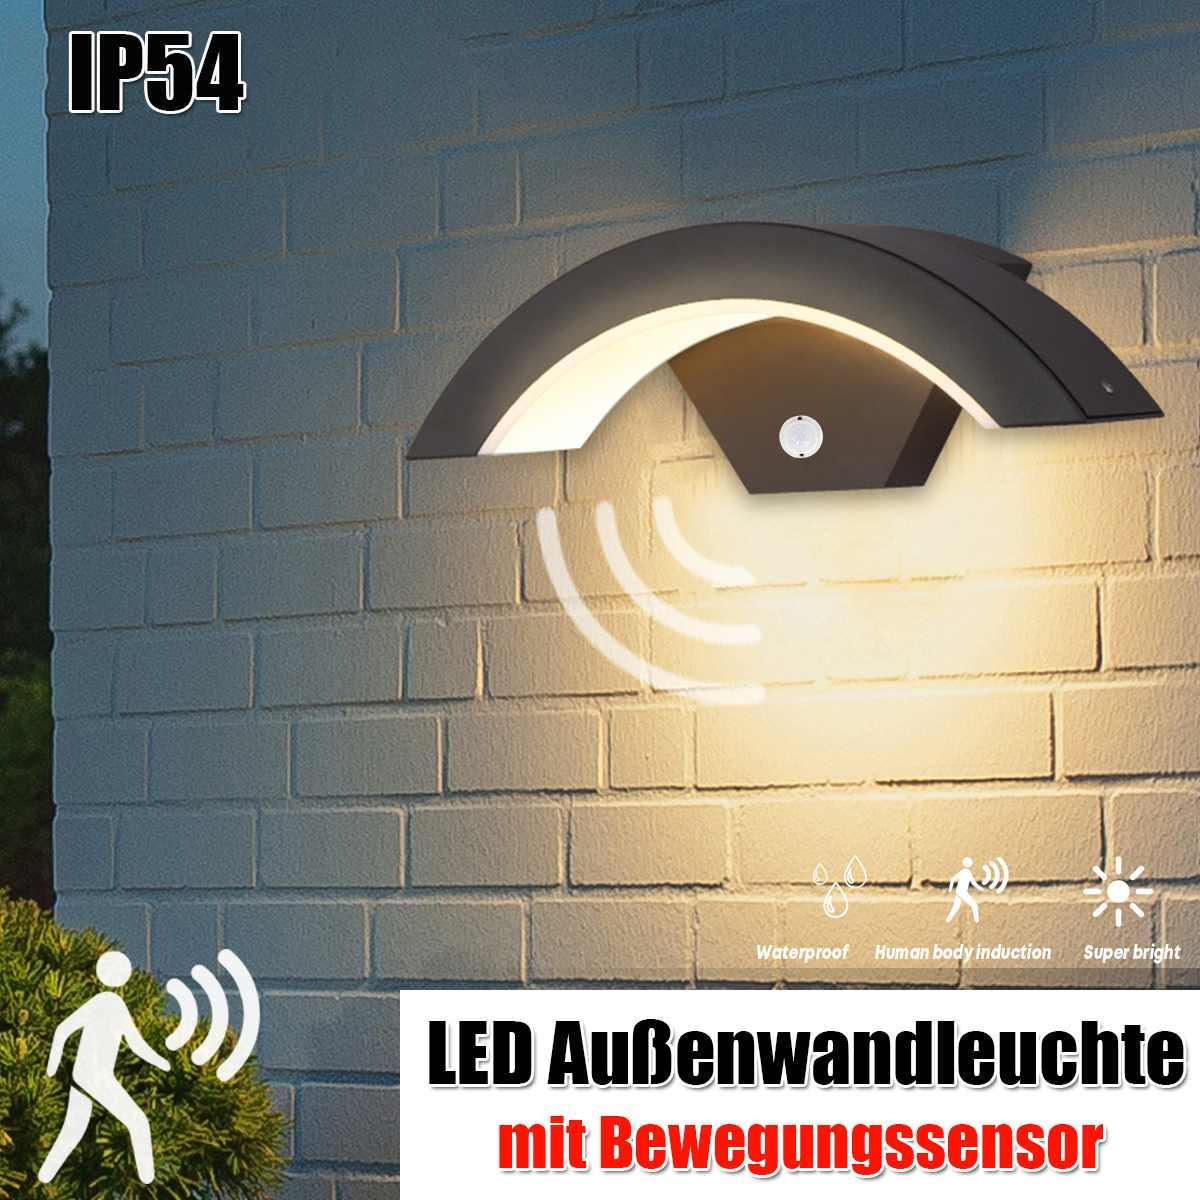 Luz de pared al aire libre 15W Sensor de movimiento LED lámpara de pared jardín porche de jardín exterior cálido luz blanca impermeable IP54 a prueba de intemperie